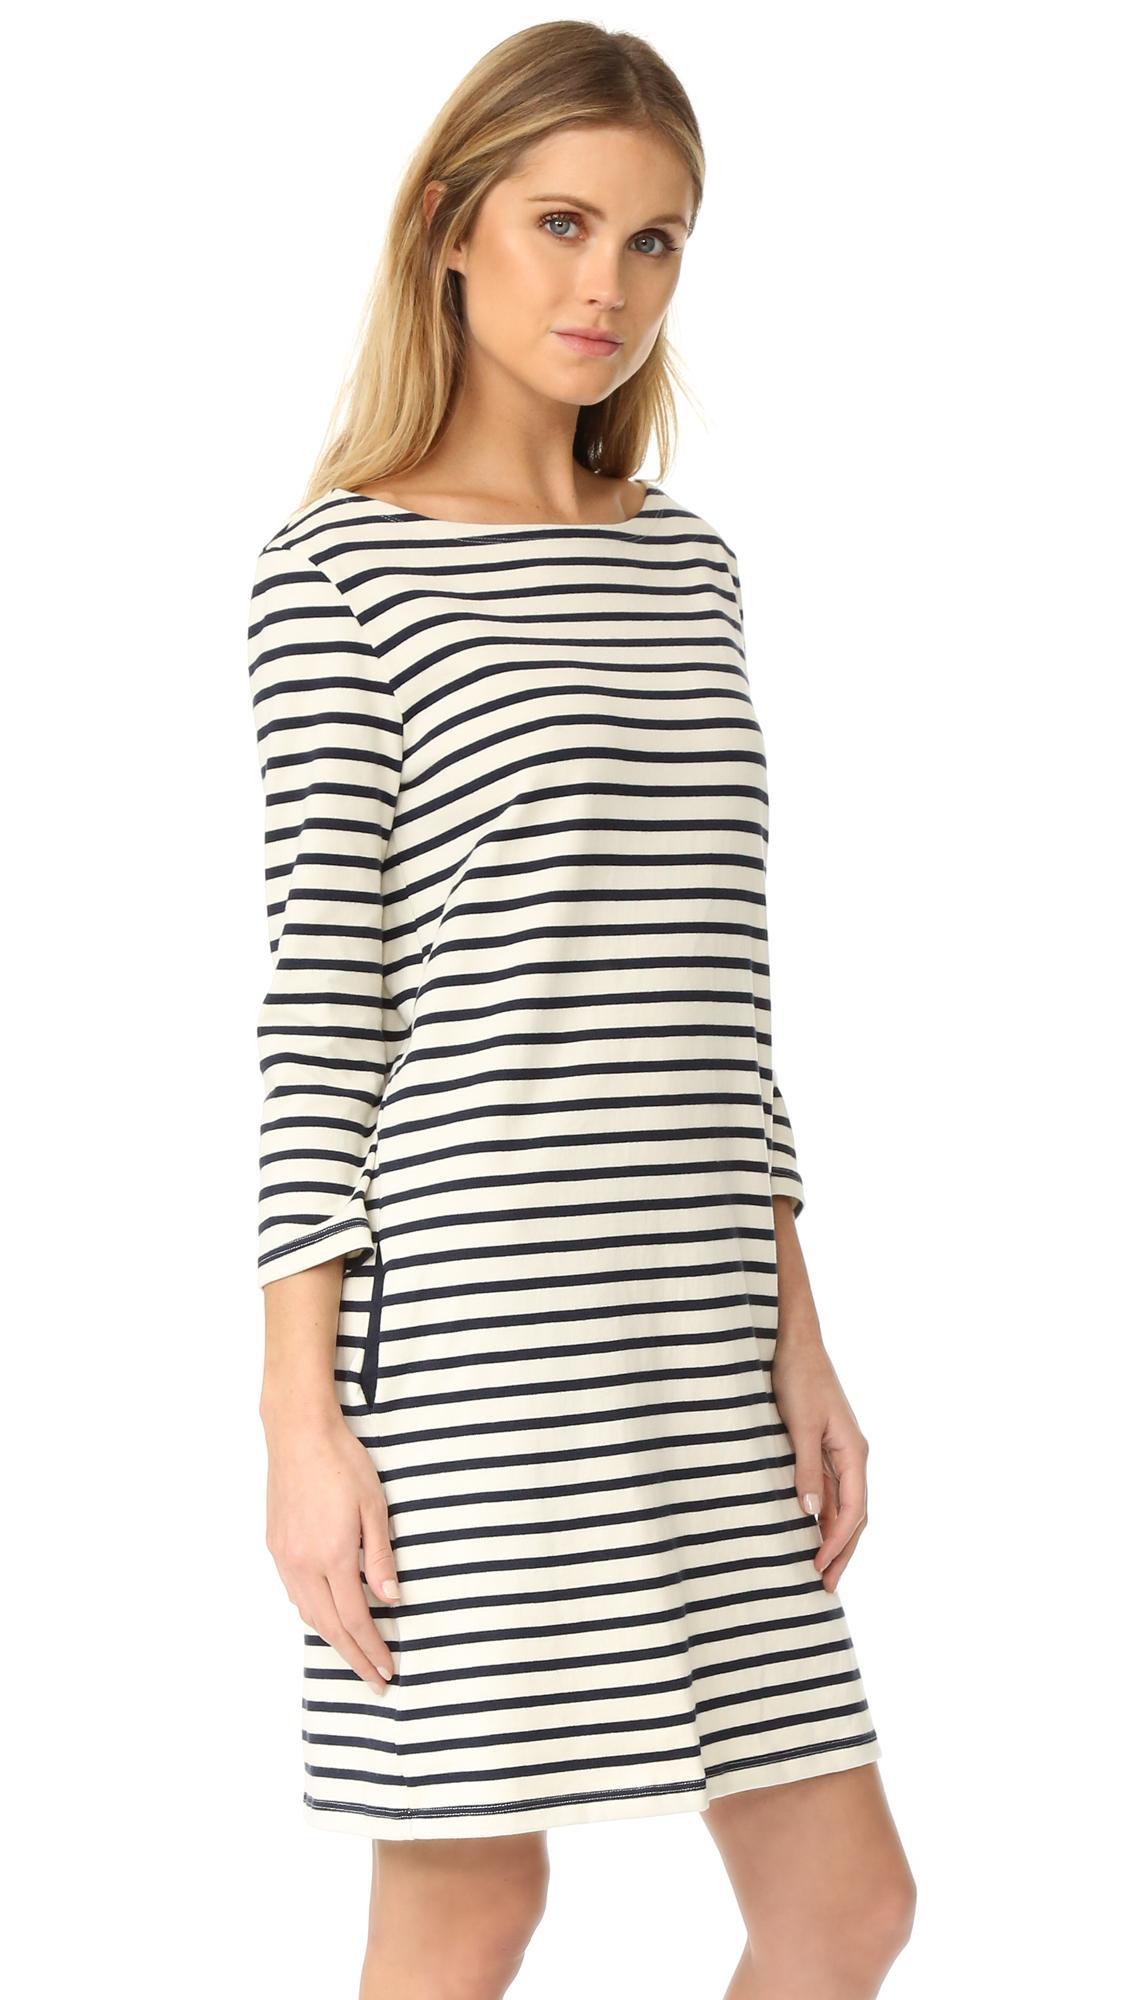 Petit bateau hannah long sleeve striped dress lyst for Petit bateau striped shirt